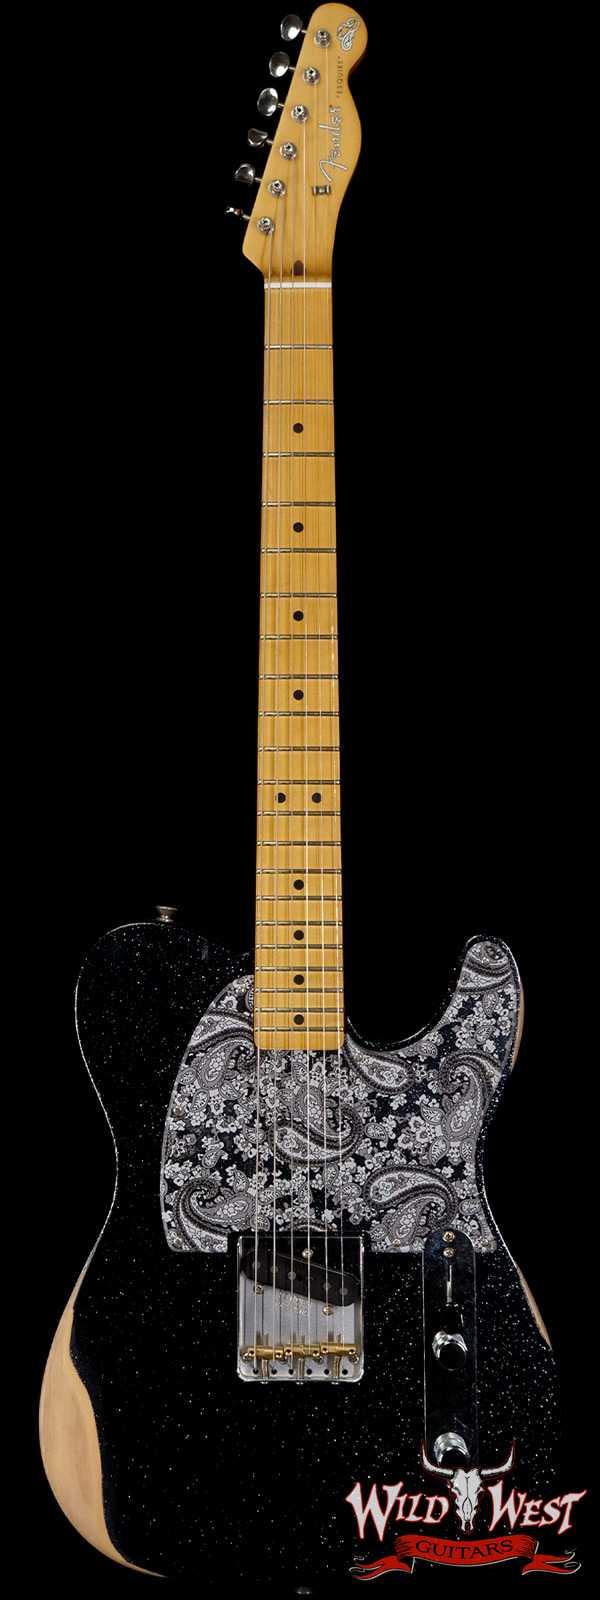 Fender Brad Paisley Esquire Road Worn Black Sparkle 5 LBS 15 OZ